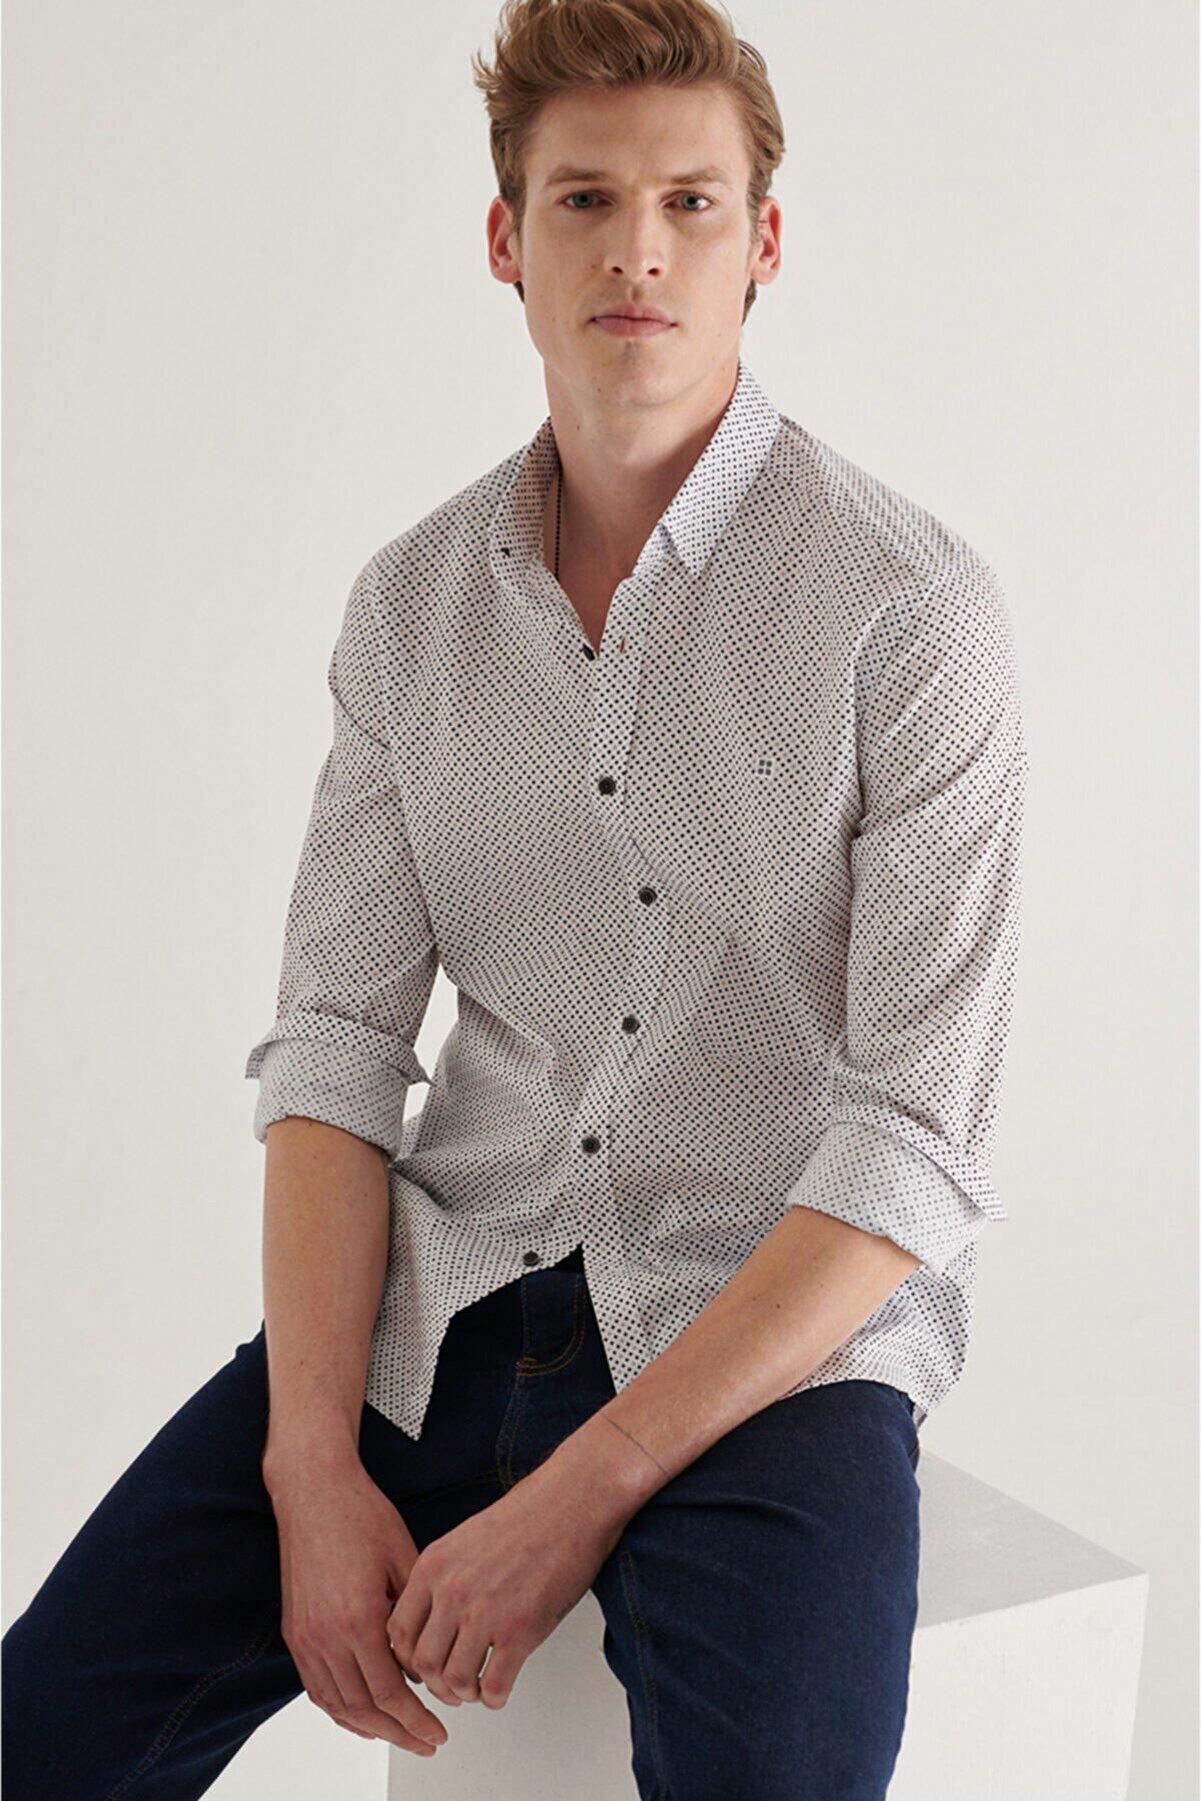 Avva Erkek Siyah-beyaz Baskılı Alttan Britli Yaka Slim Fit Garnili Gömlek A11y2131